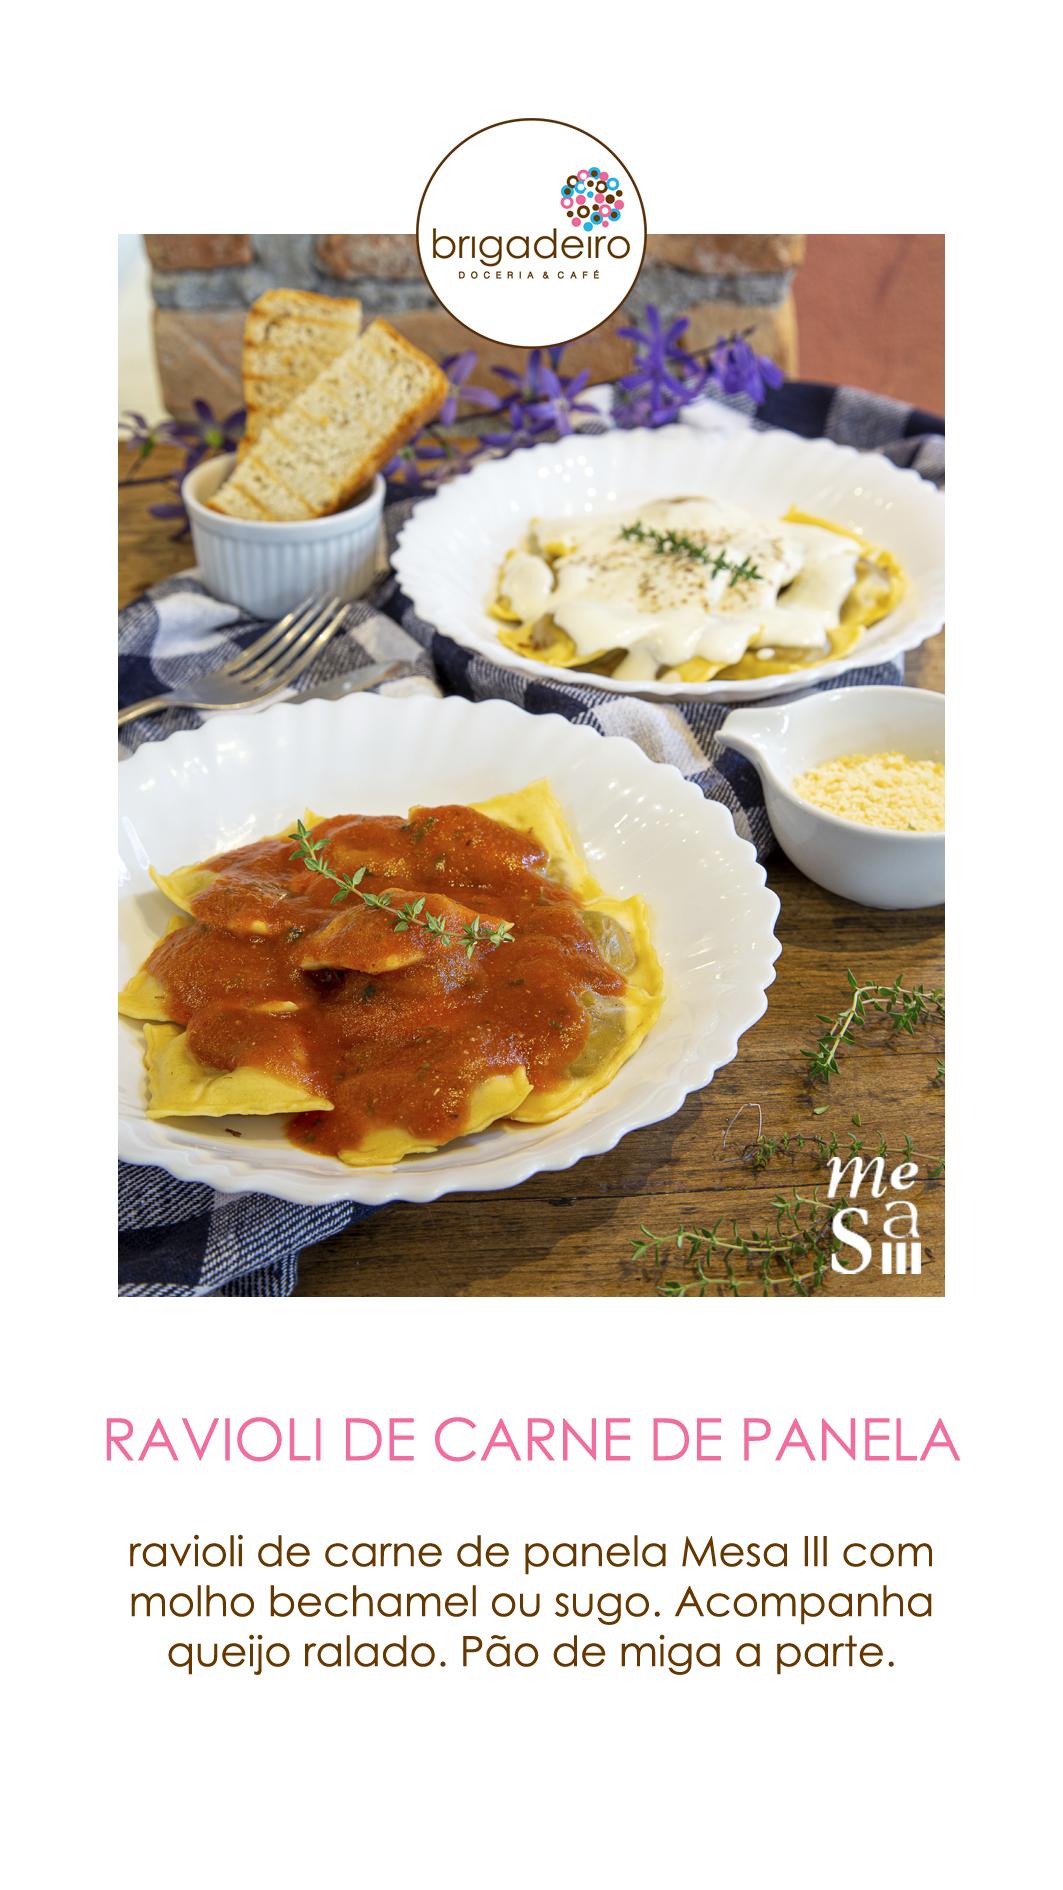 RAVIOLI DE CARNE DE PANELA